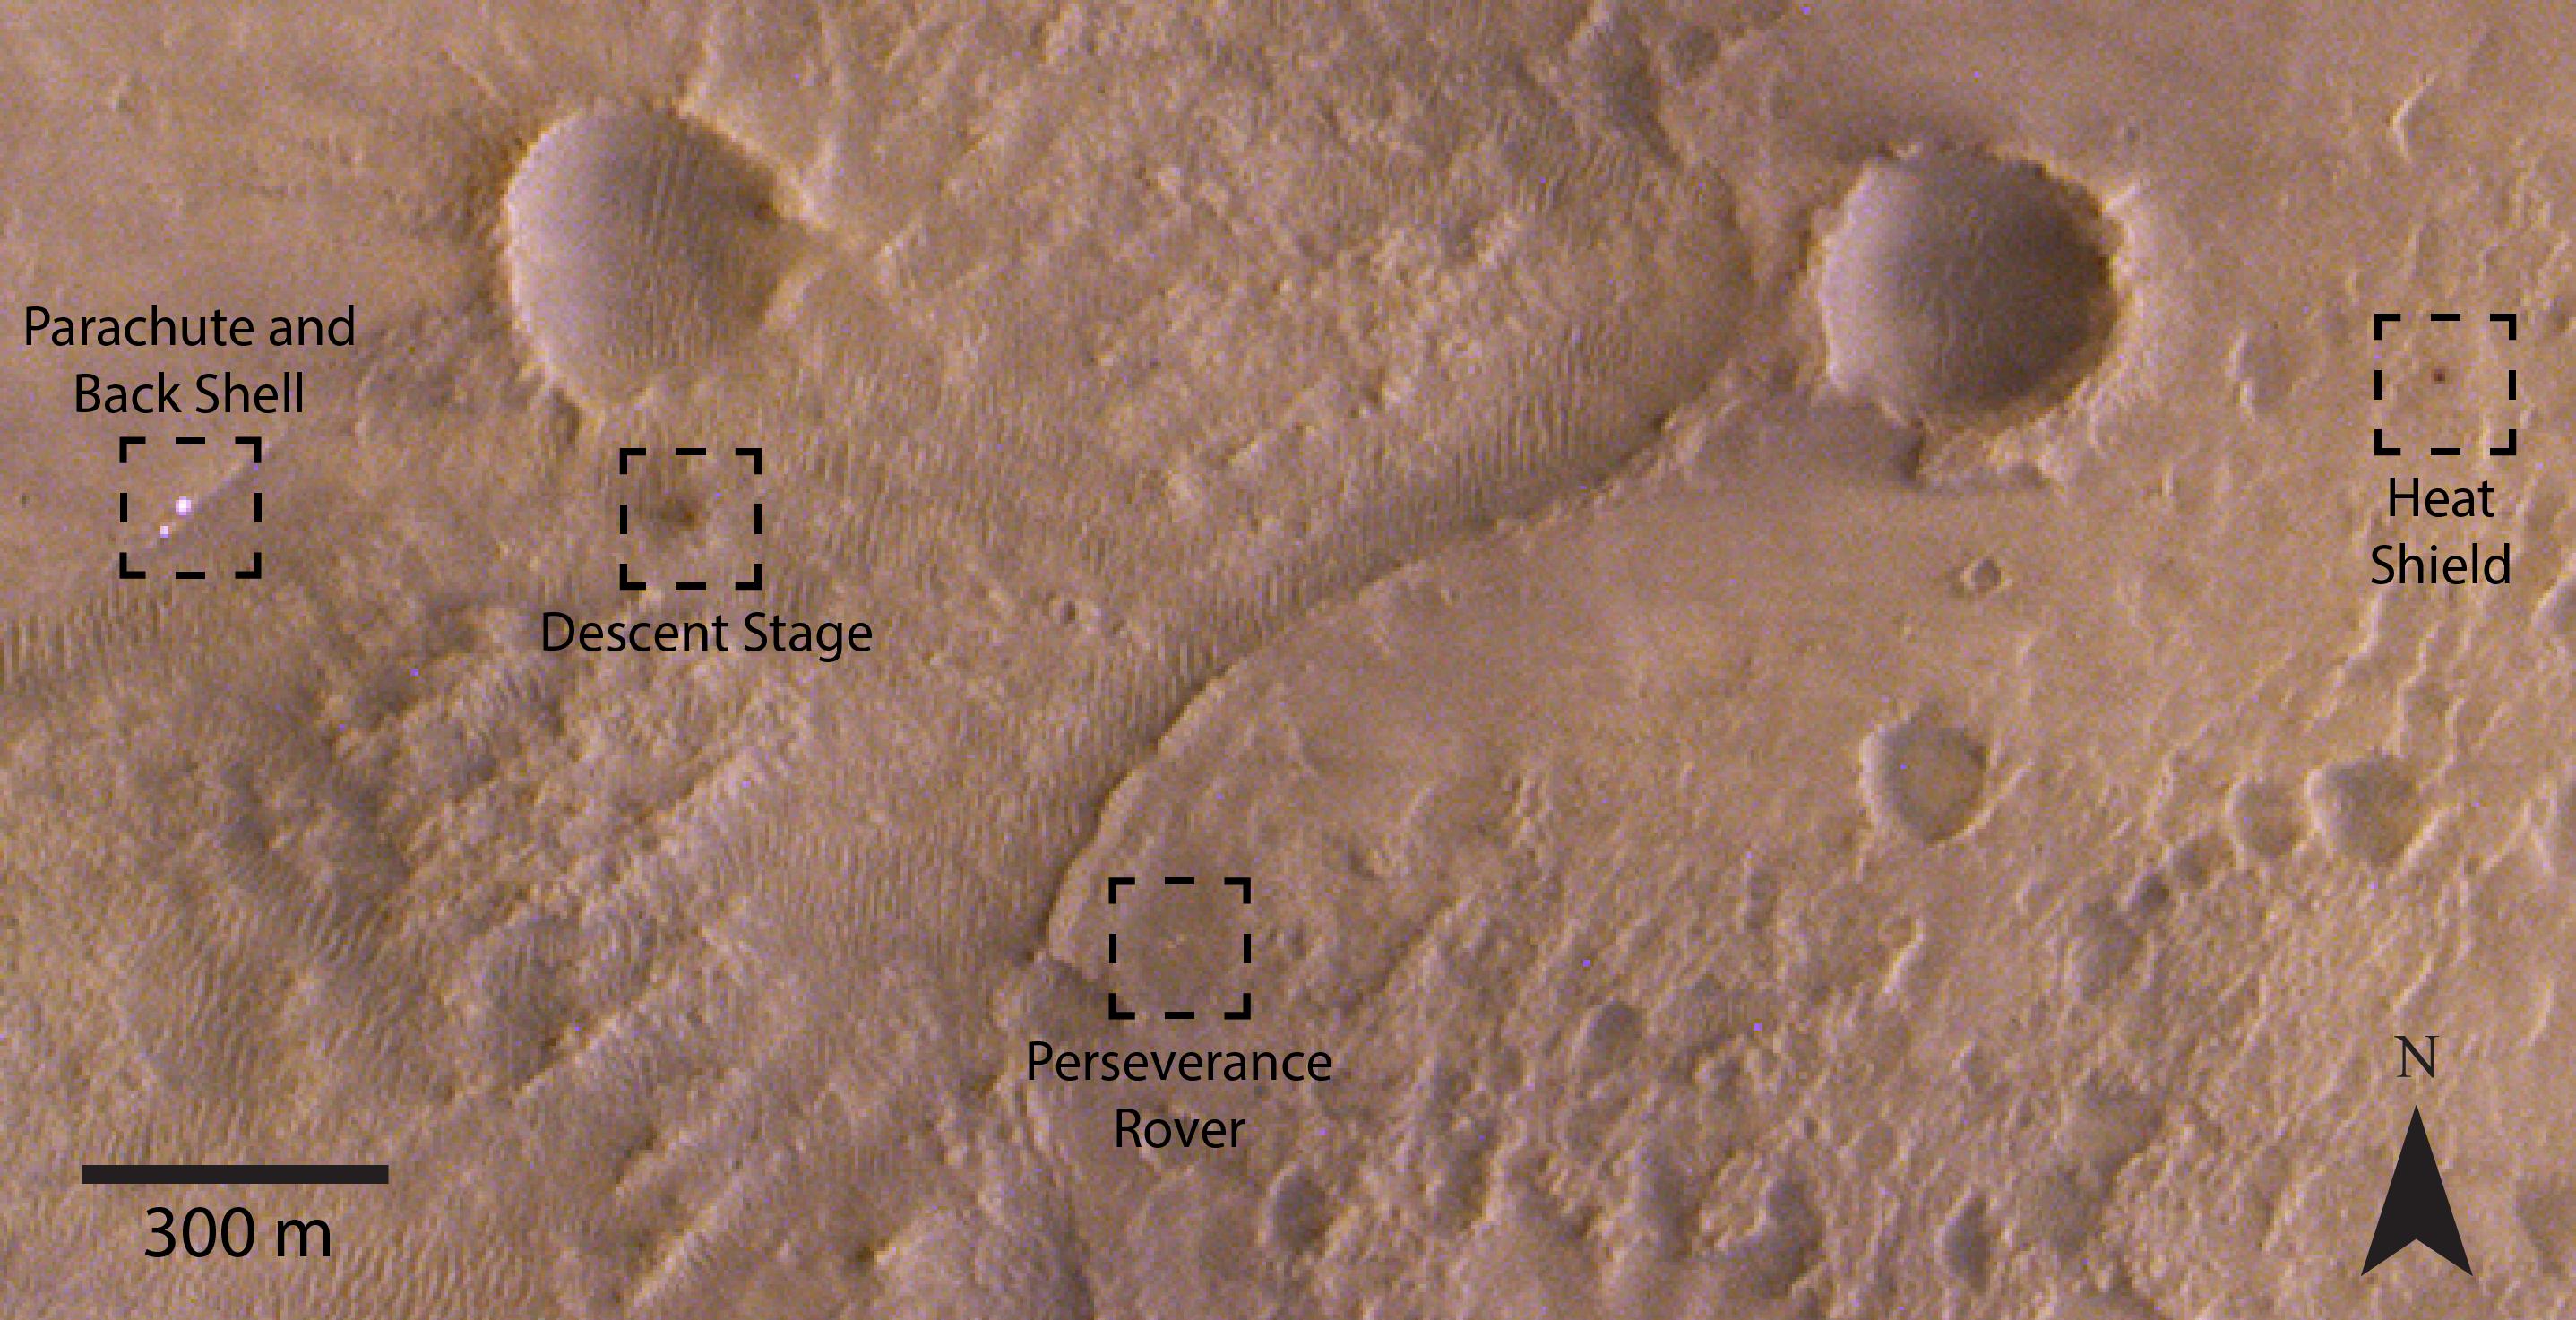 ExoMars_orbiter_images_Perseverance_landing_site_labelled.png